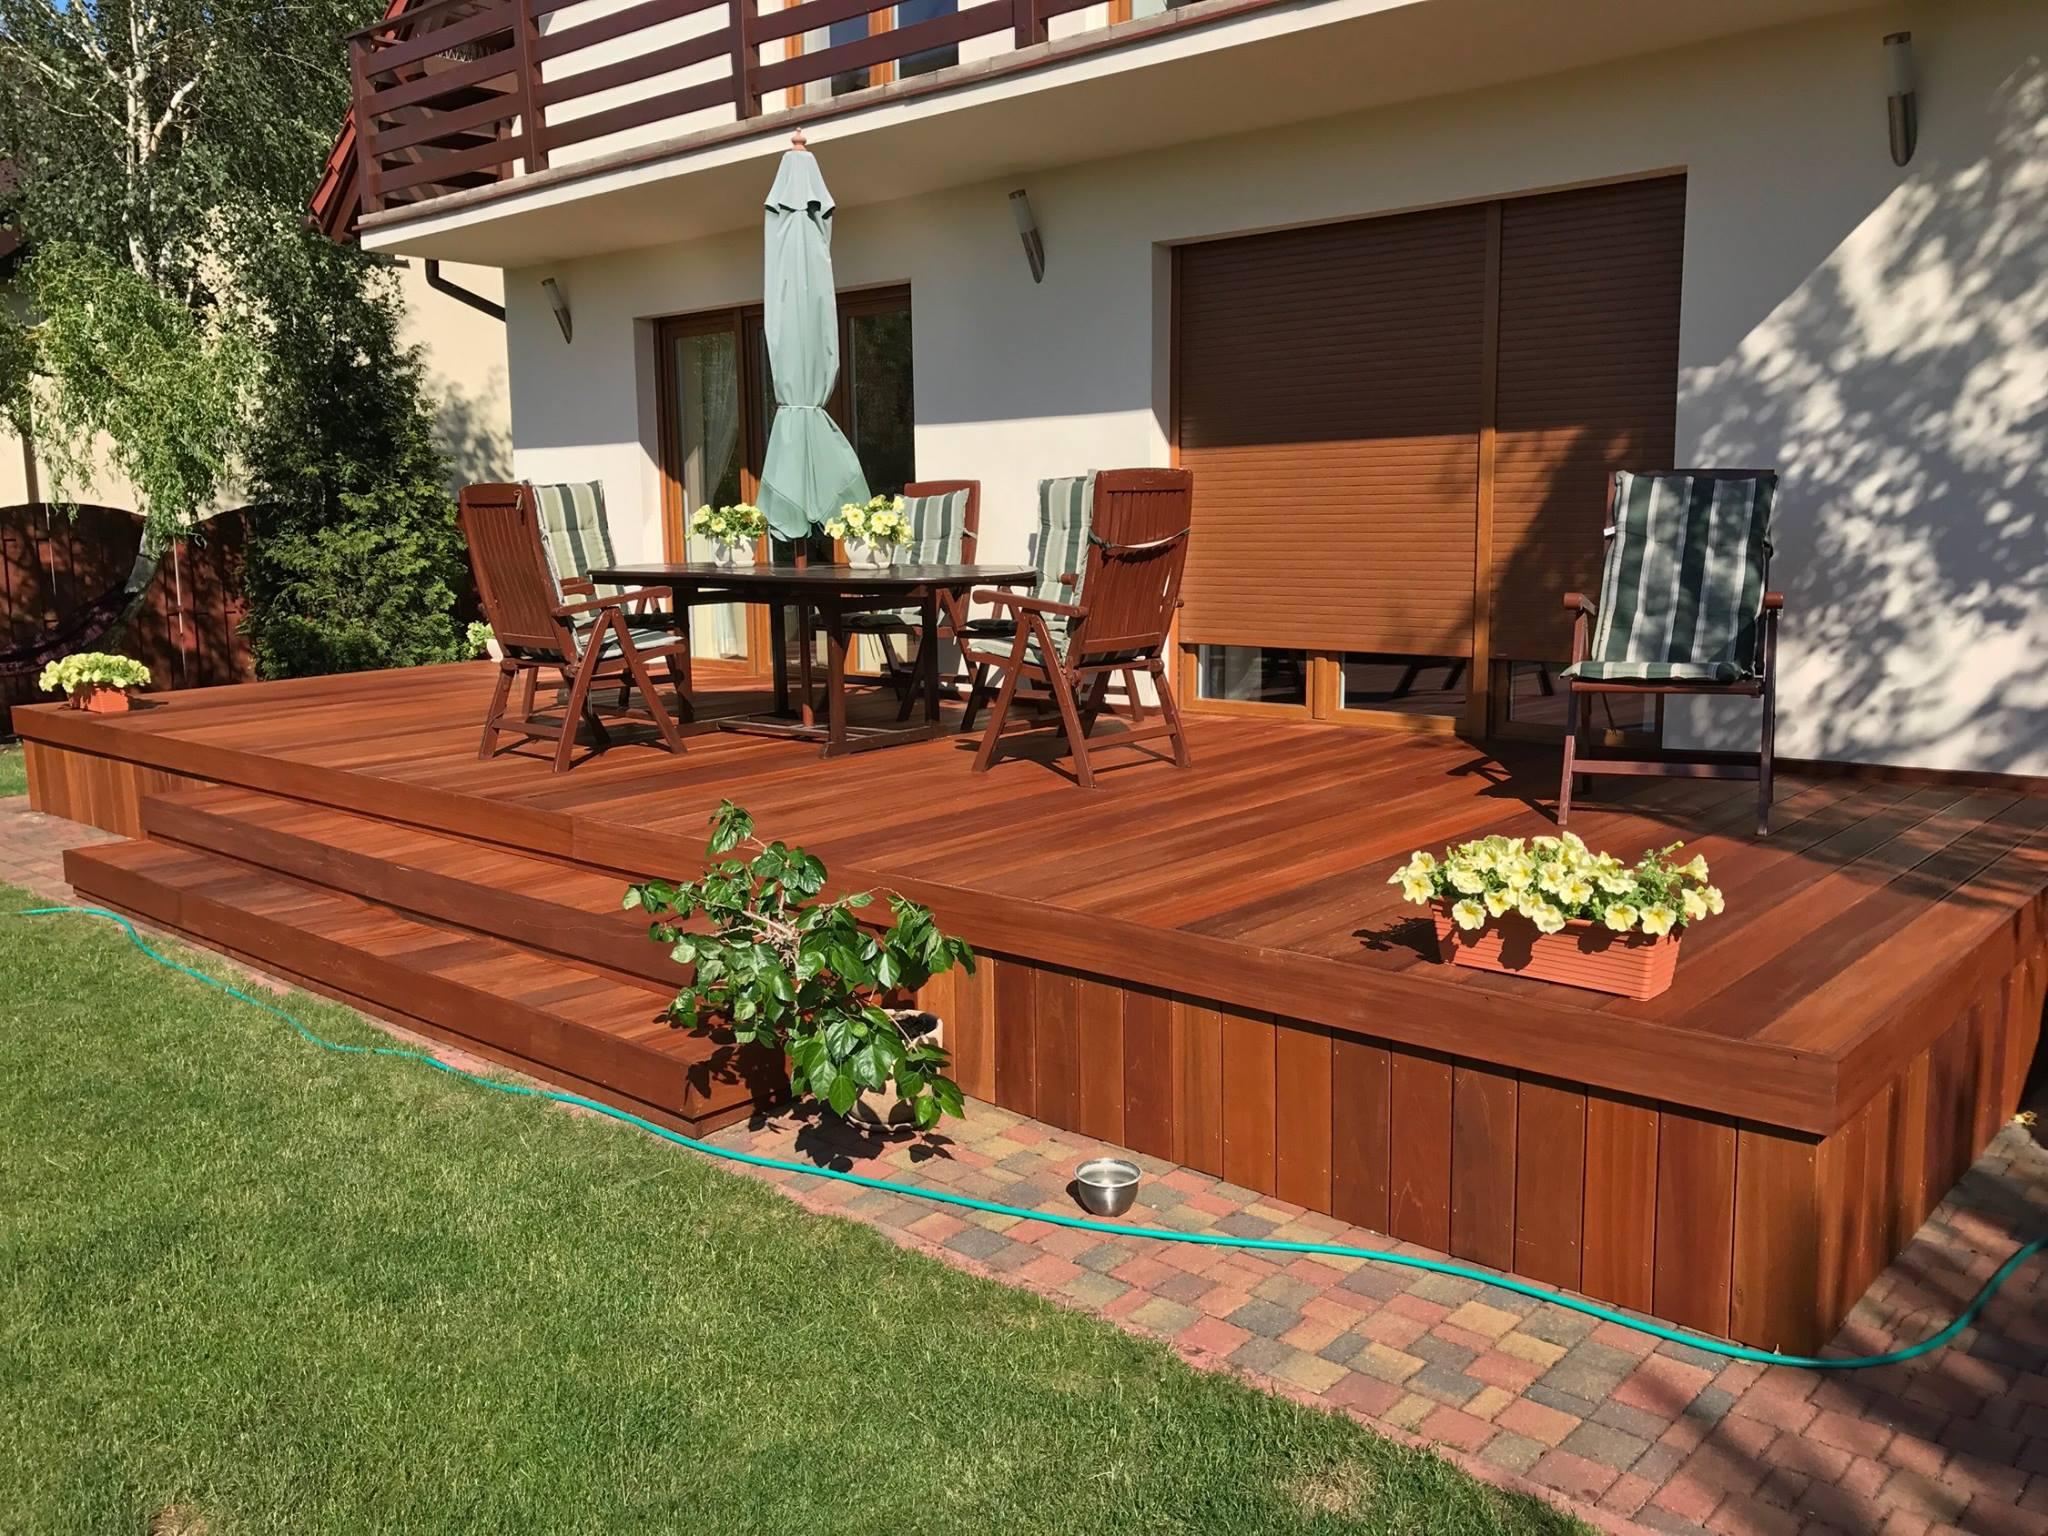 Oak yard decking